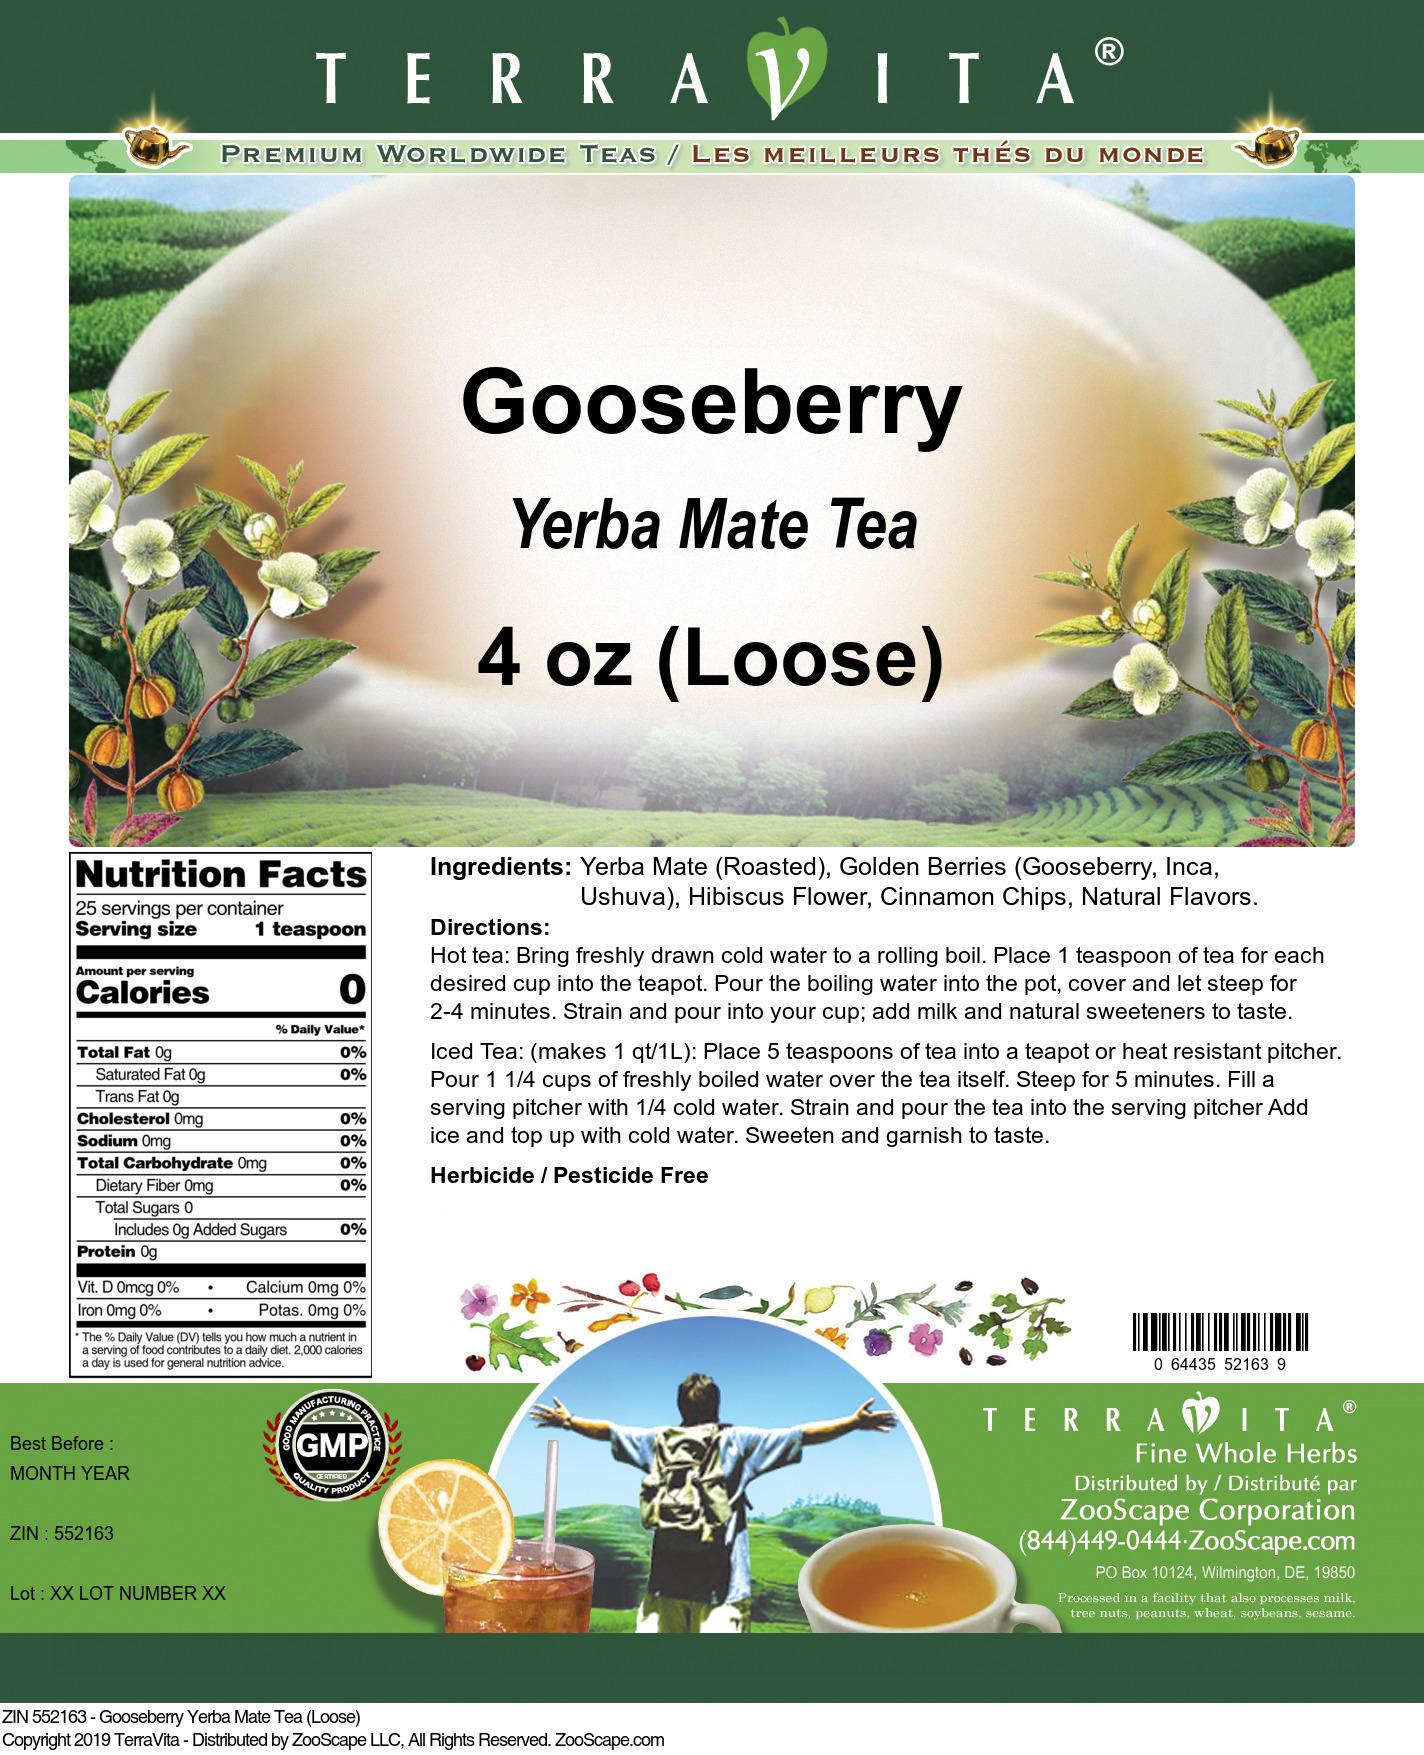 Gooseberry Yerba Mate